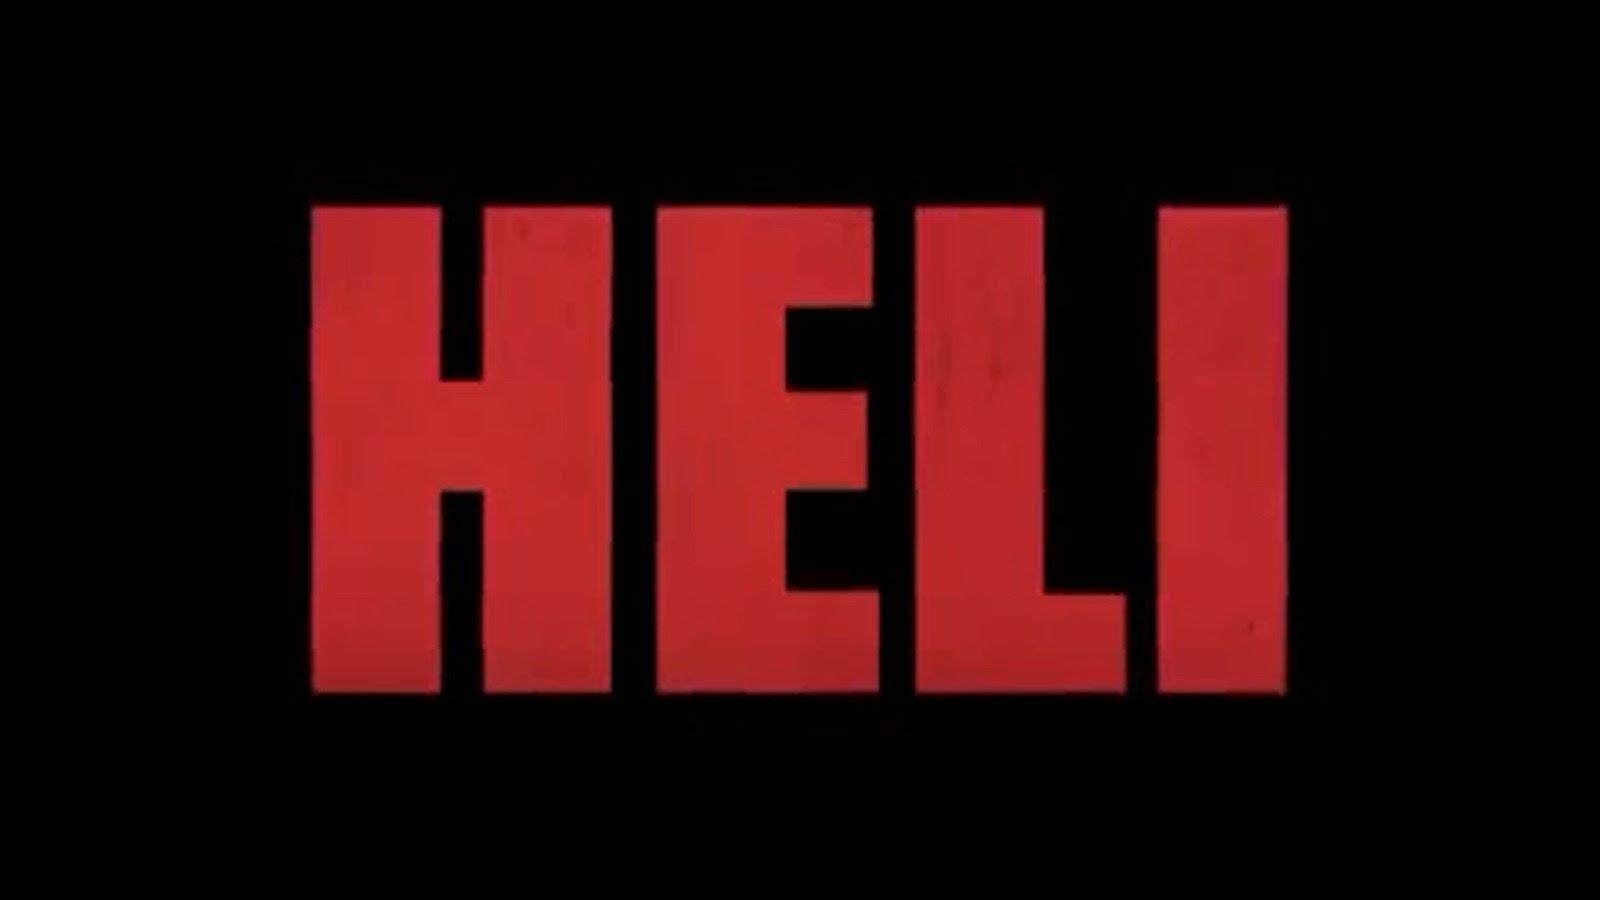 Heli Trailer